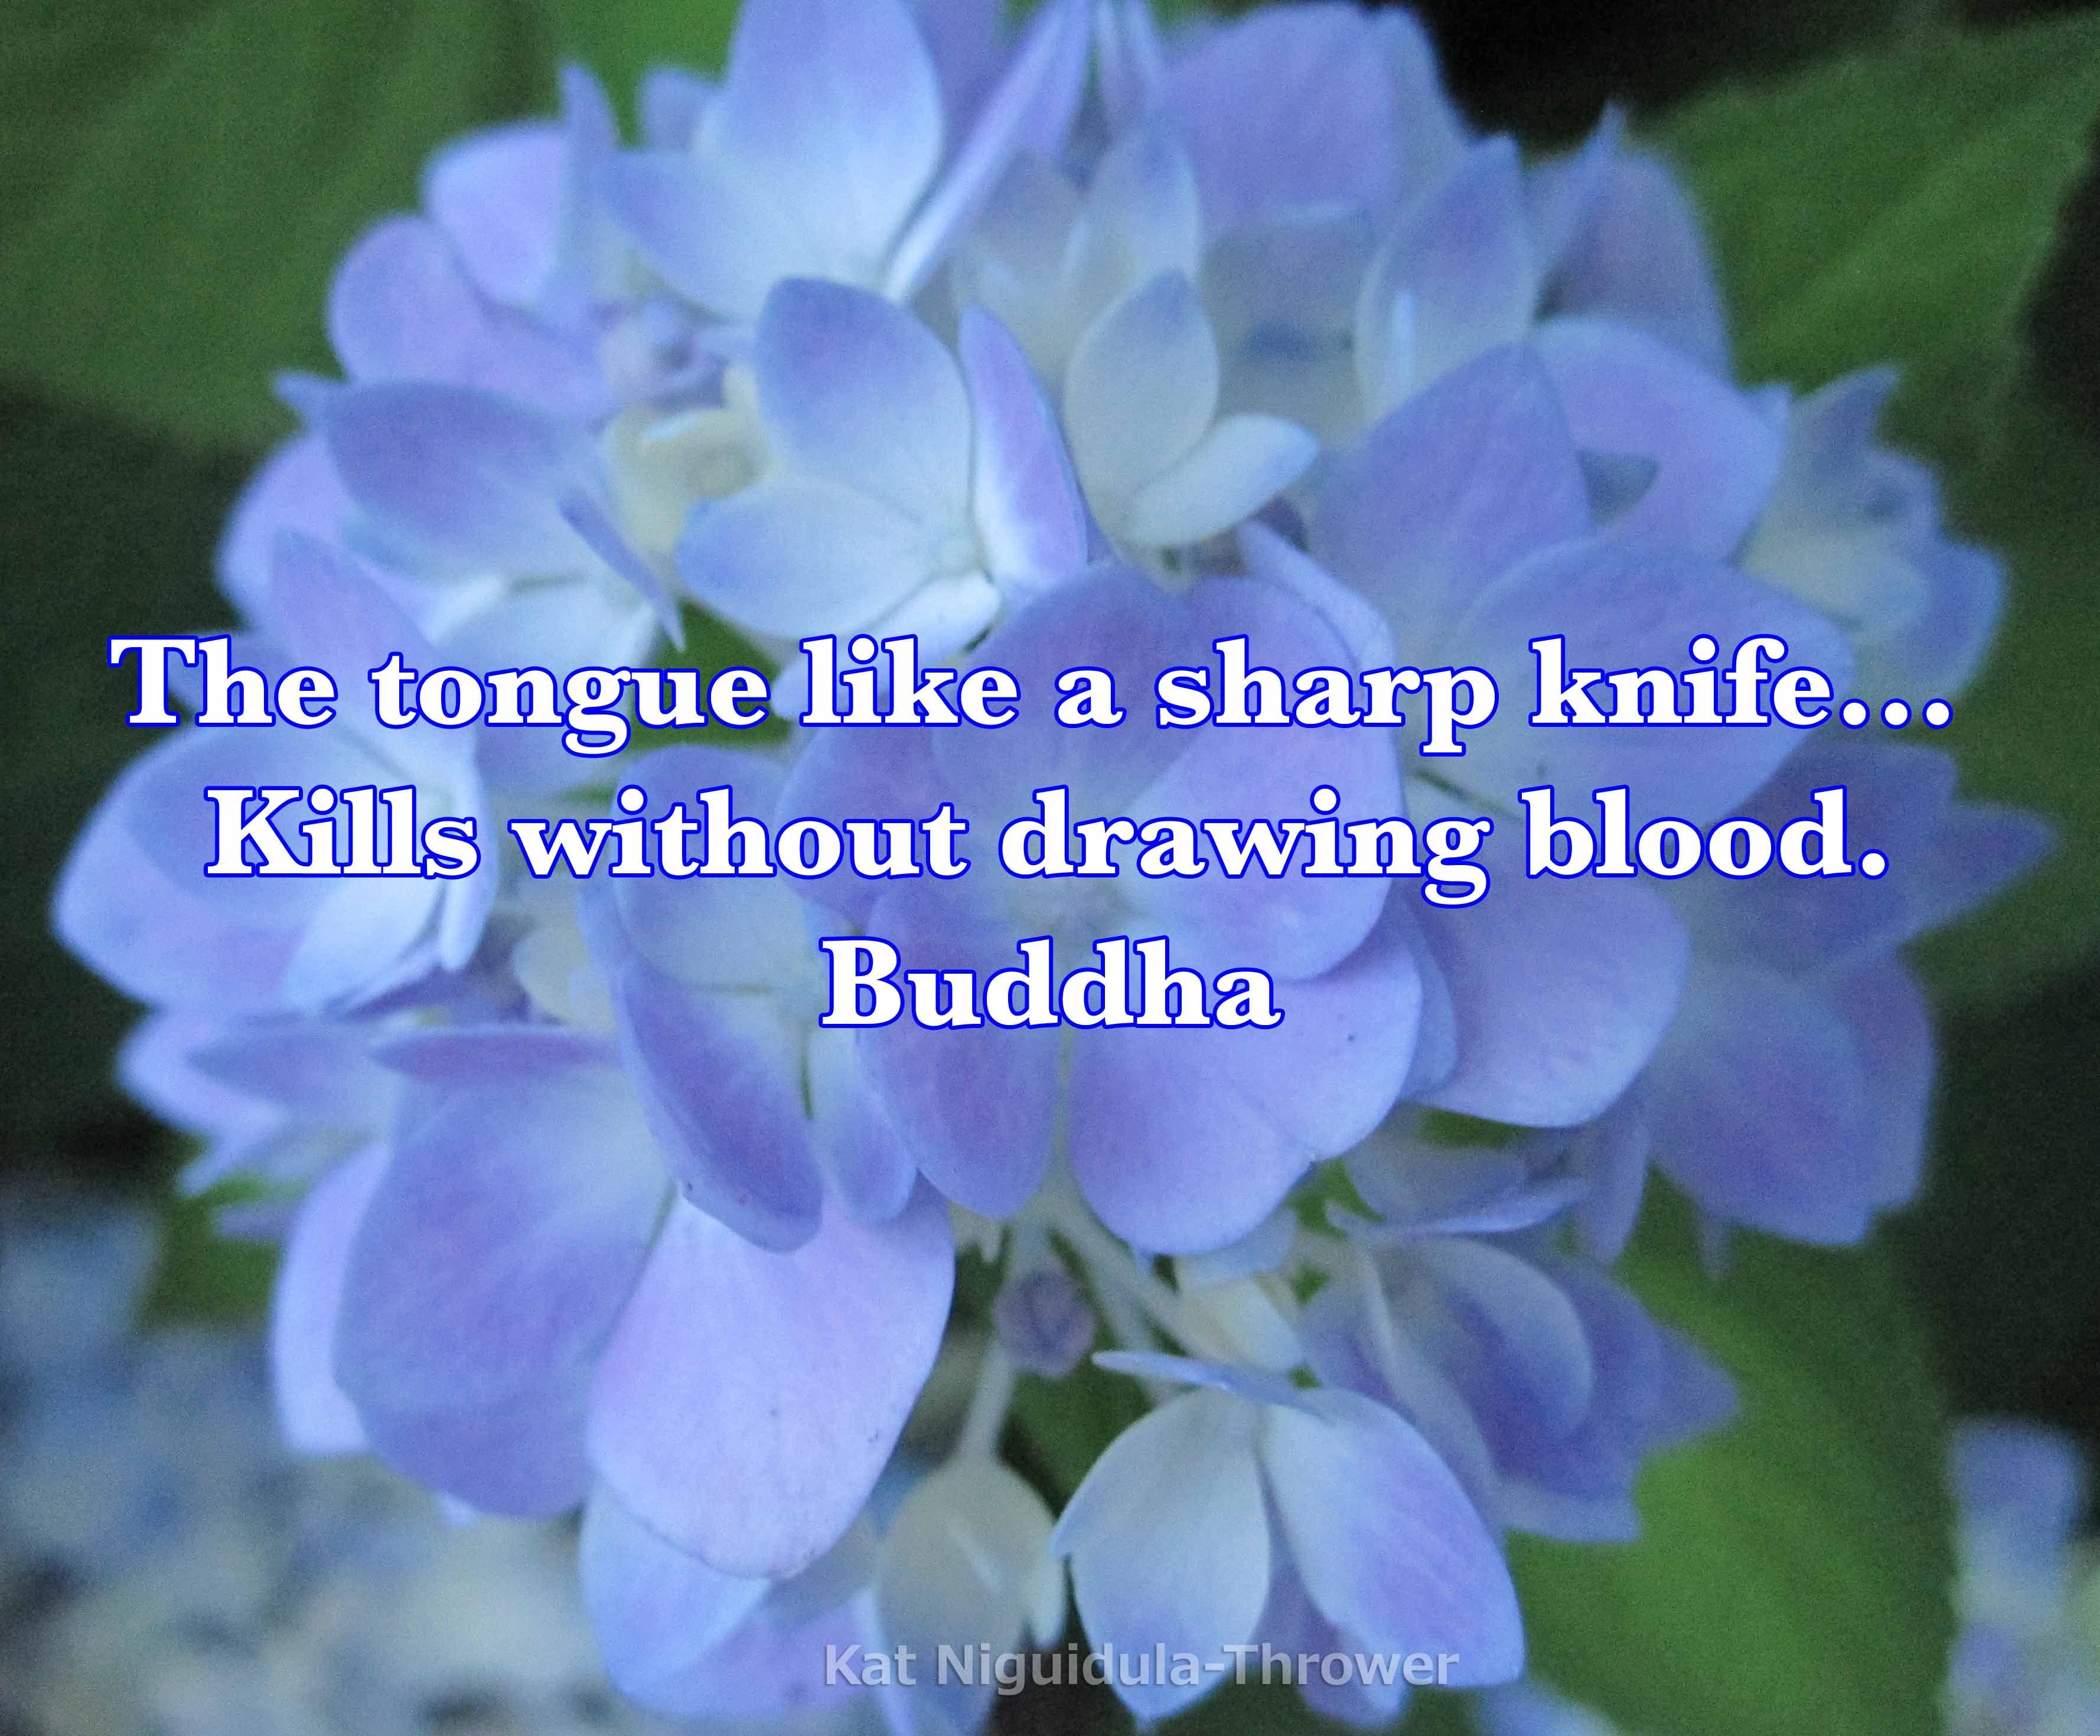 Like a Sharp Knife Kills without Drawing Blood Buddha the Tongue